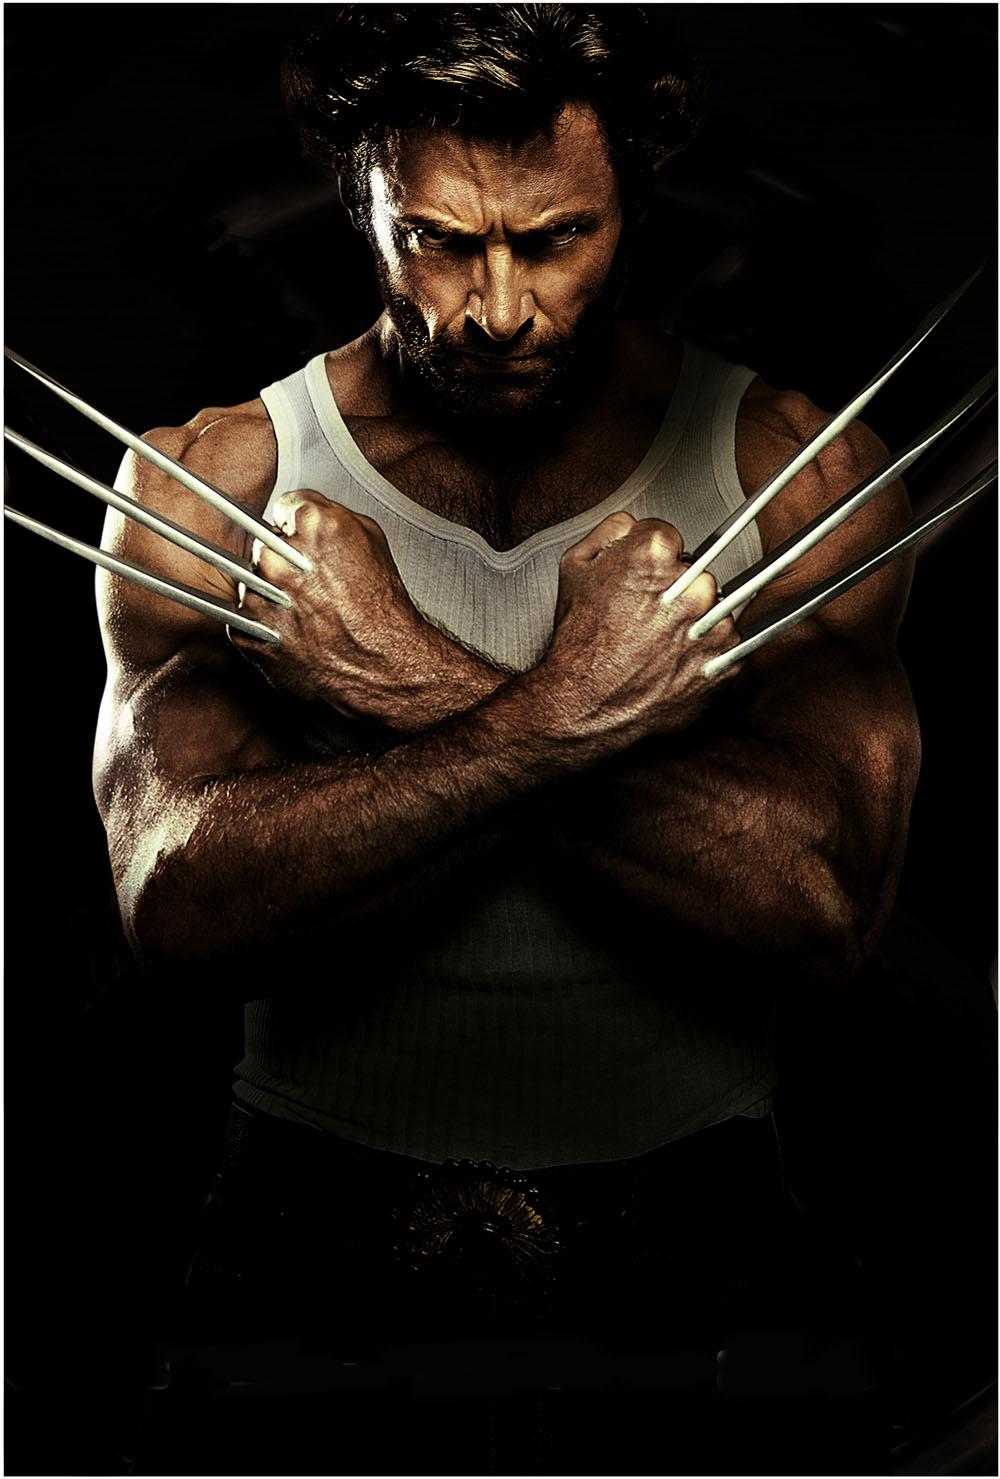 Hugh Jackman in X Men Origins: Wolverine